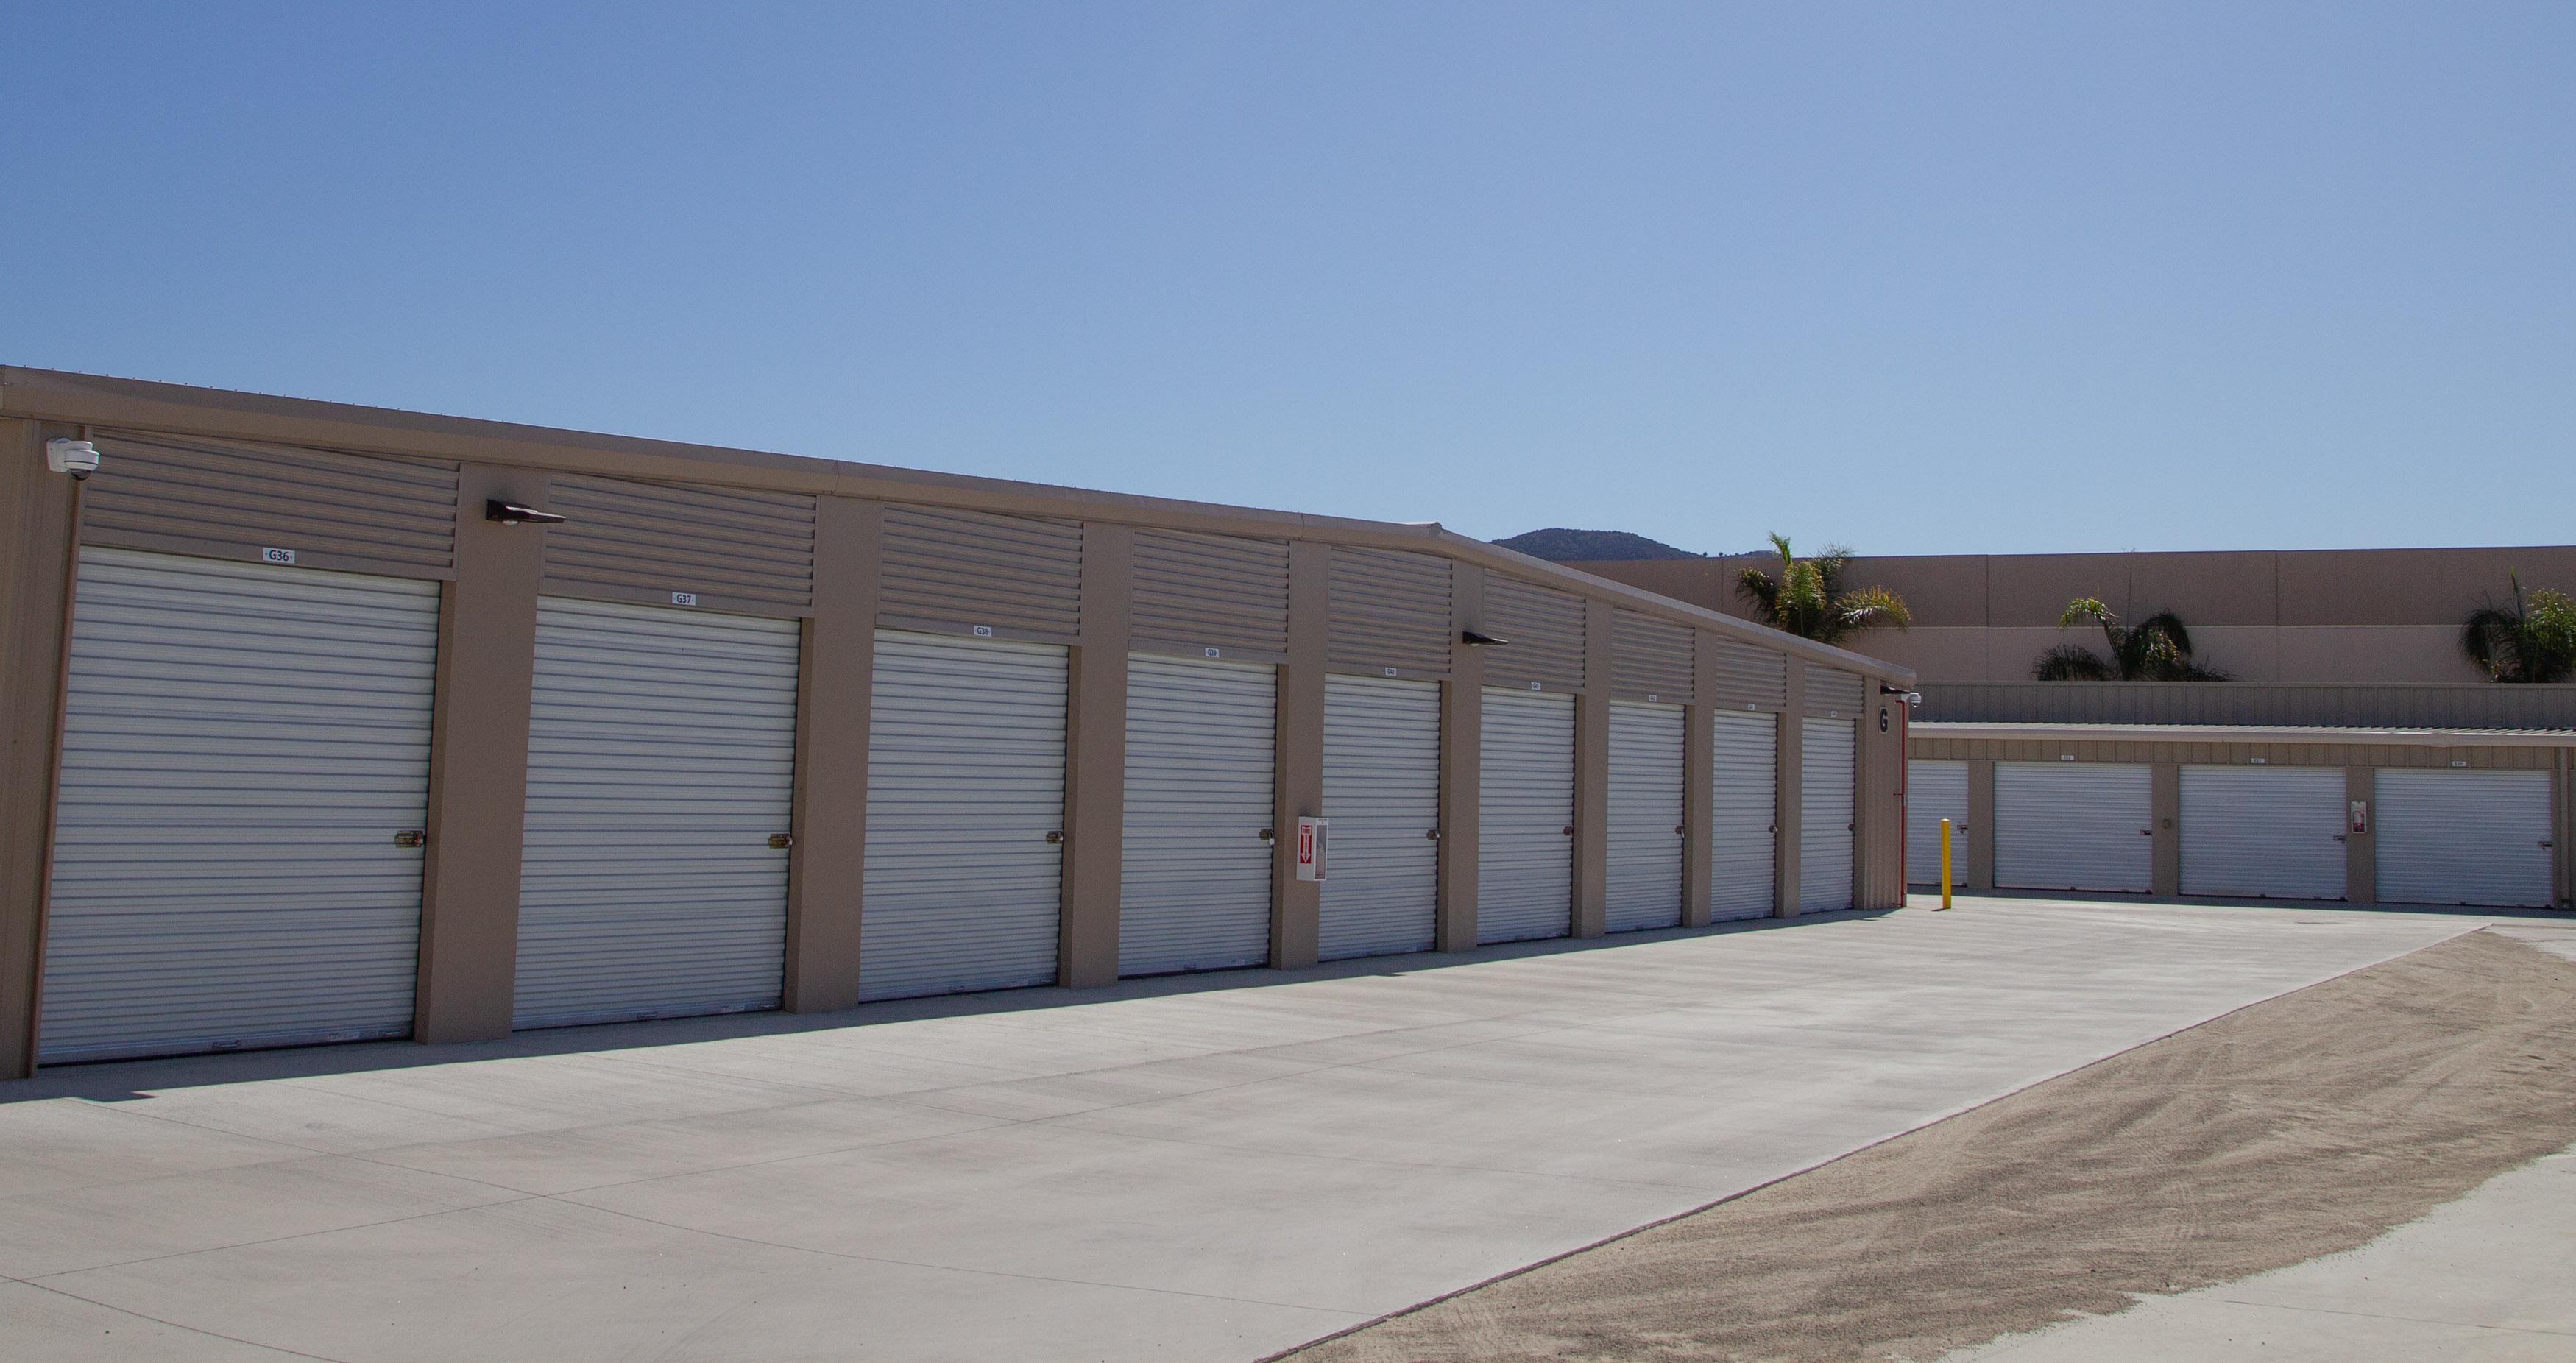 Ranpac Self Storage Facility in Murrieta, CA